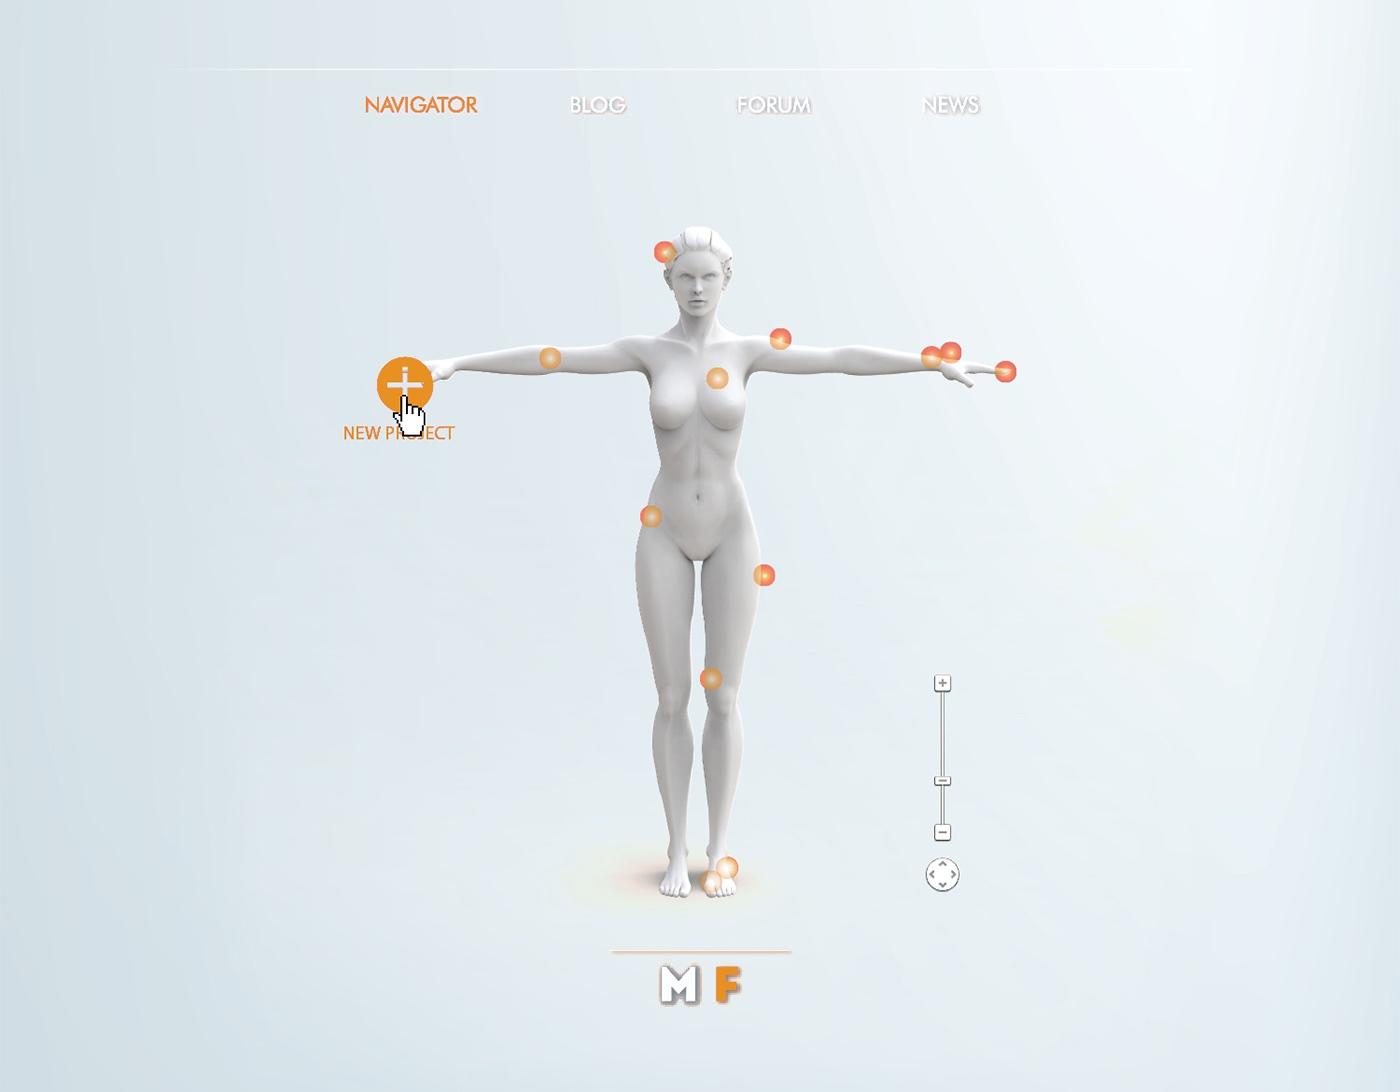 Jawbone EXO Ecosystem by Fabio Besti - 3D Navigator